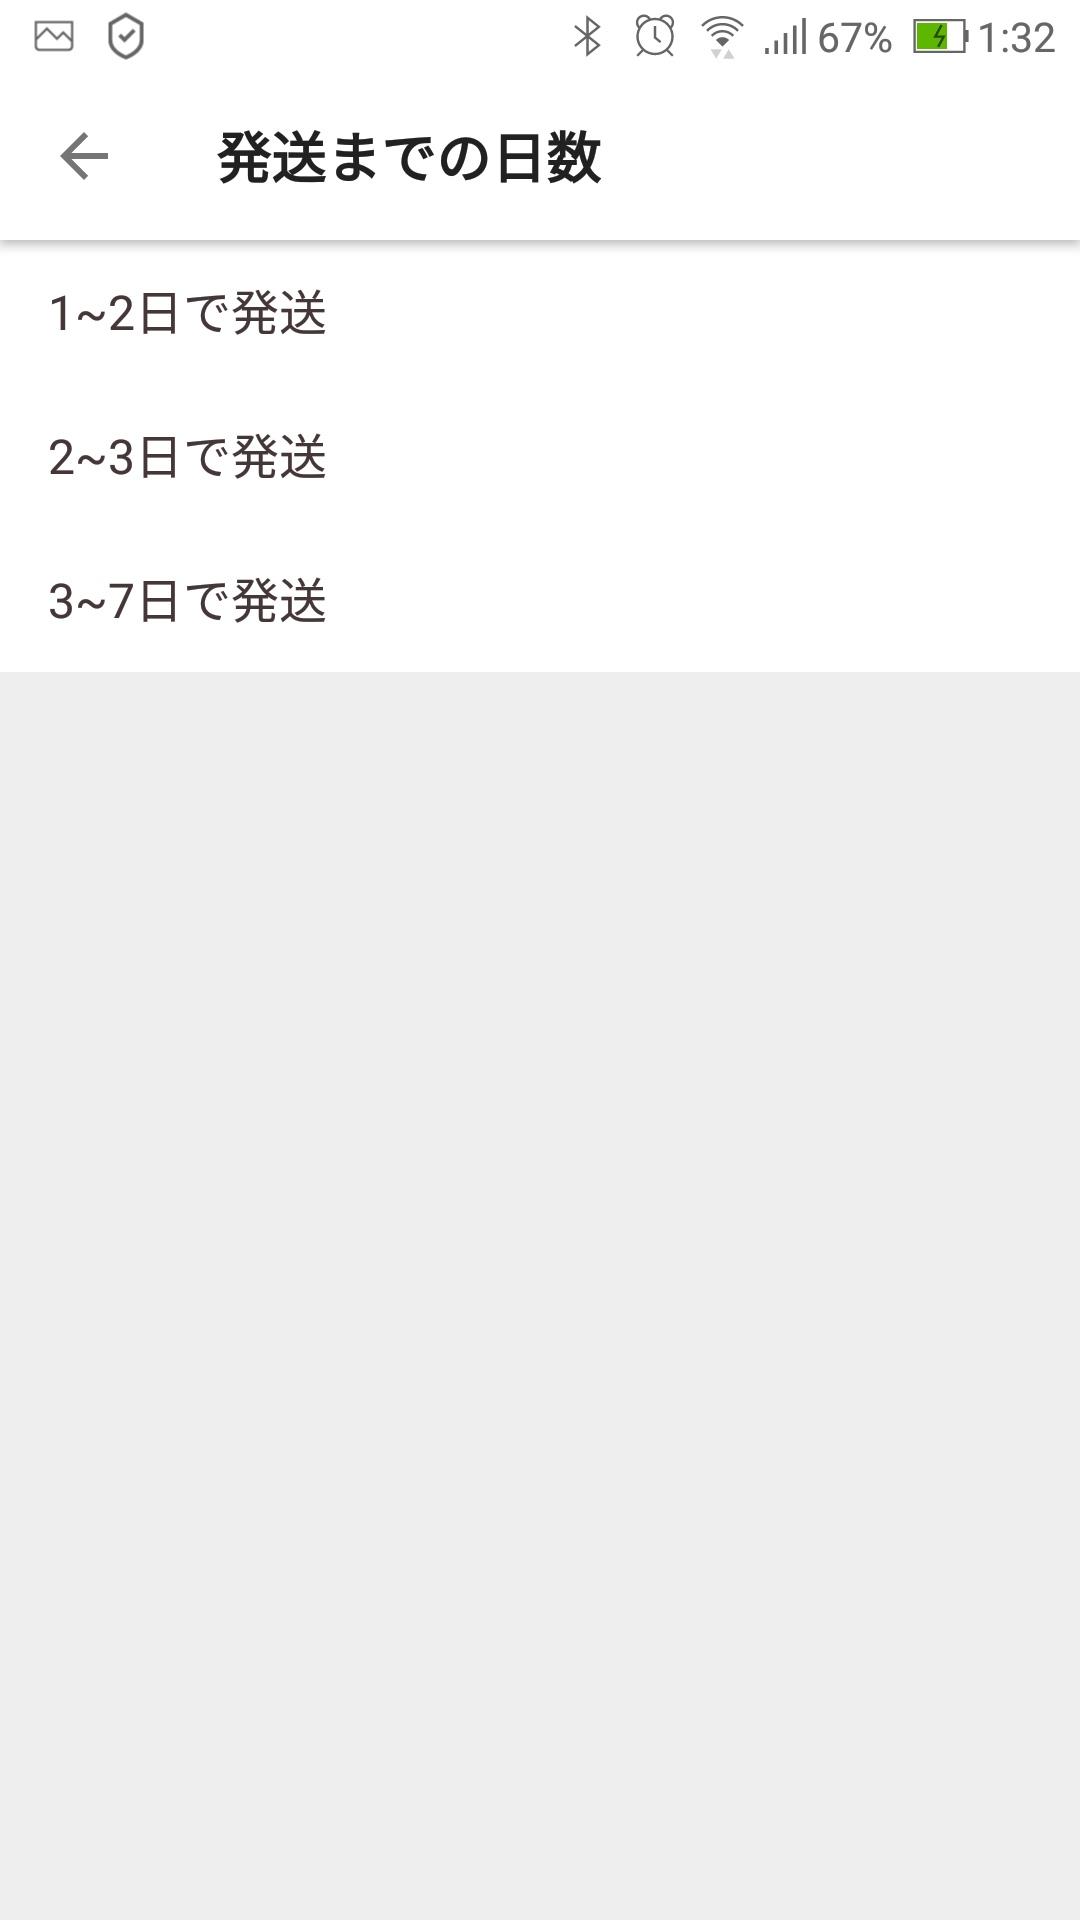 Screenshot 20191102 013251 - メルカリからPayapyフリマへ出品切り替えと比較~最短手順・画像付き